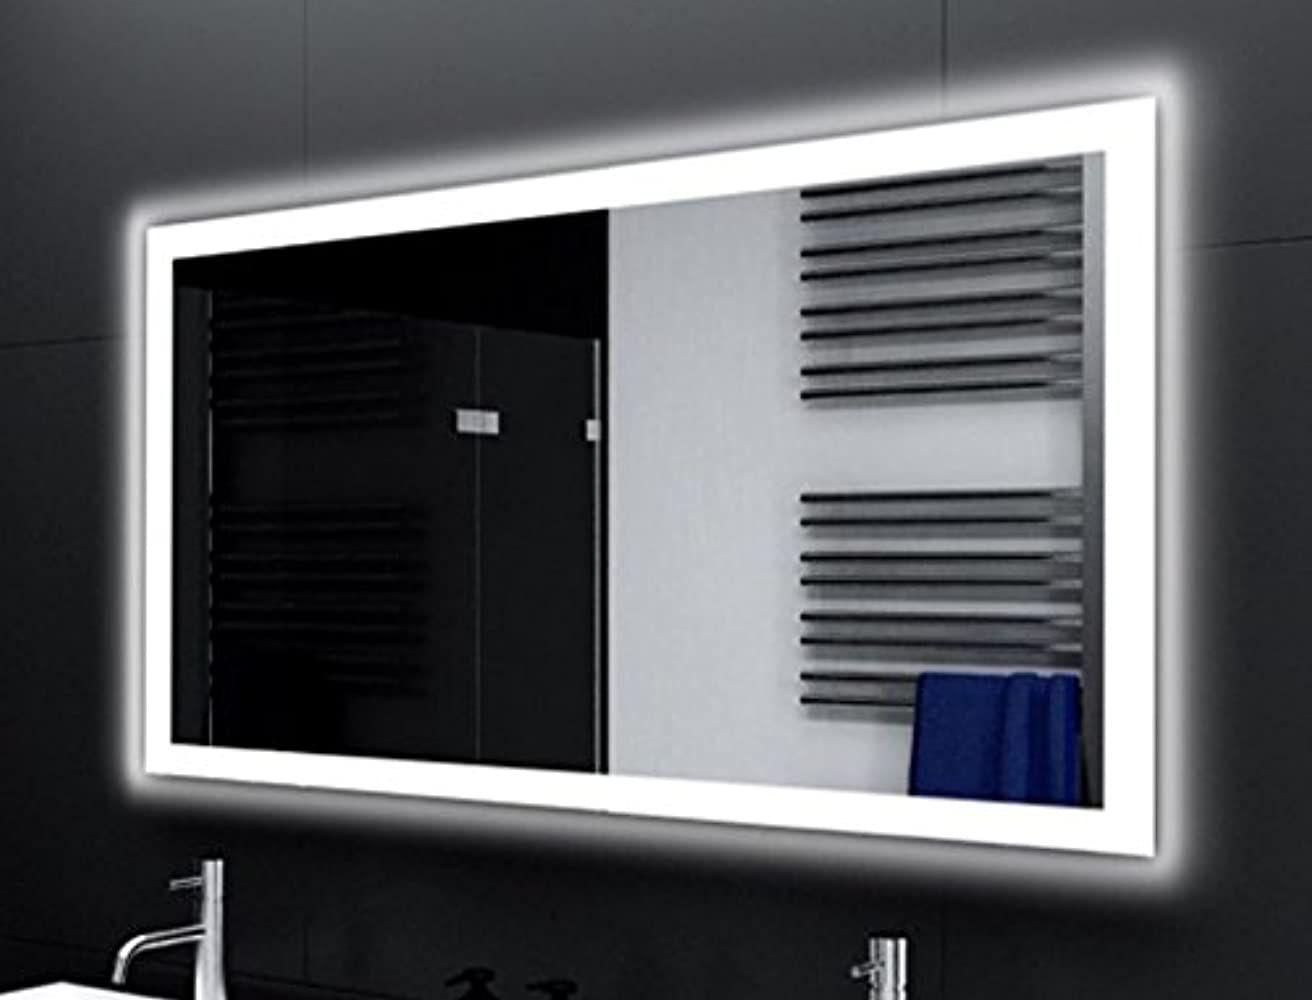 Badspiegel Designo Ma4110 Mit A Led Beleuchtung B 60 Cm X H